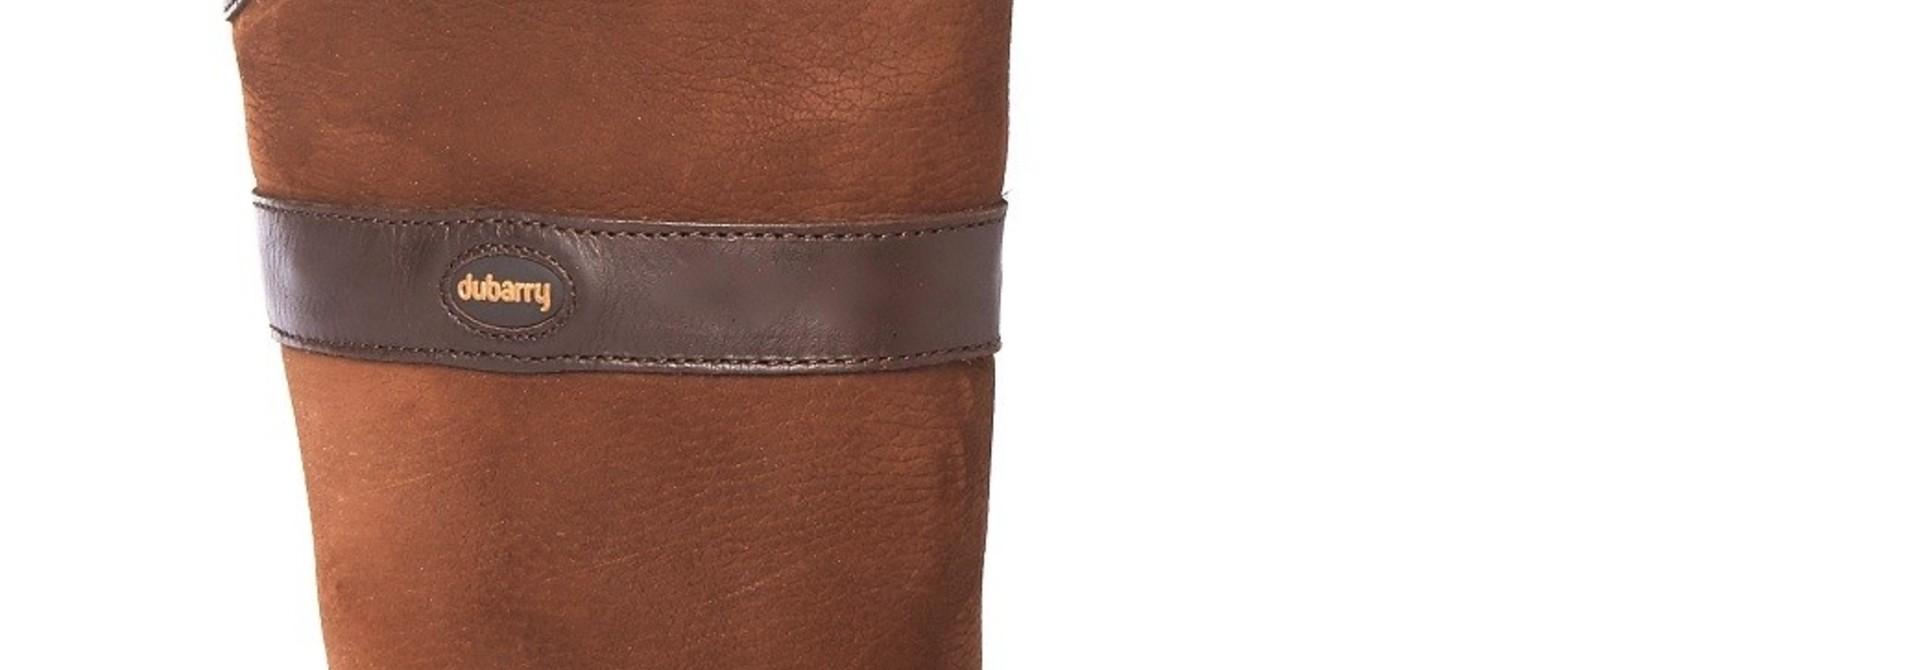 Dubarry Kildare outdoor laarzen - Walnut